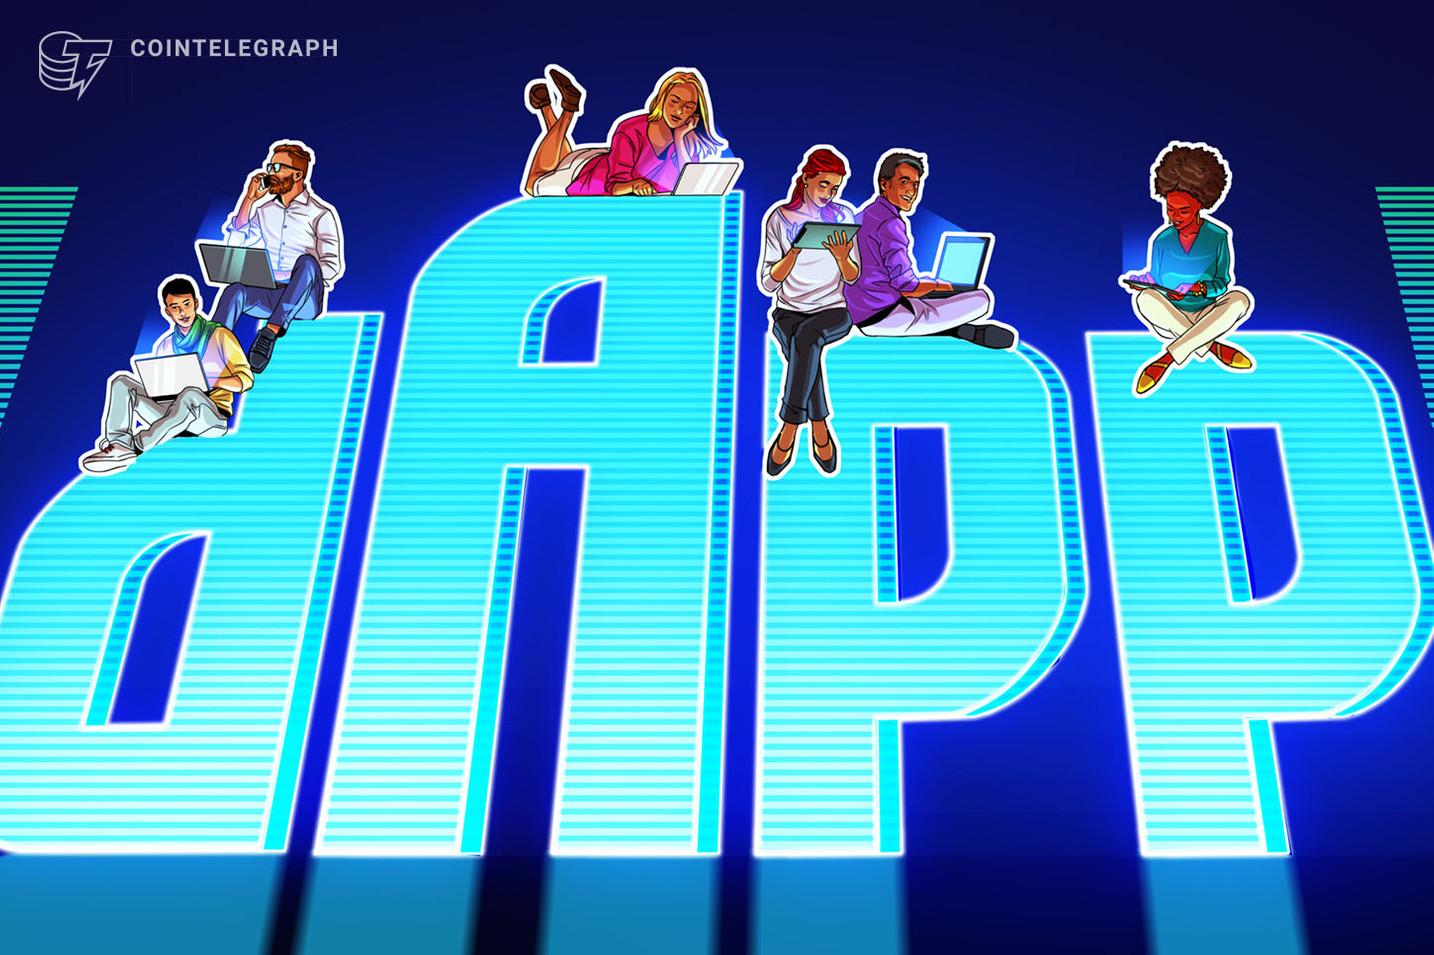 DeFi boom drives 1,200% increase in DApp volume in 2020: Report